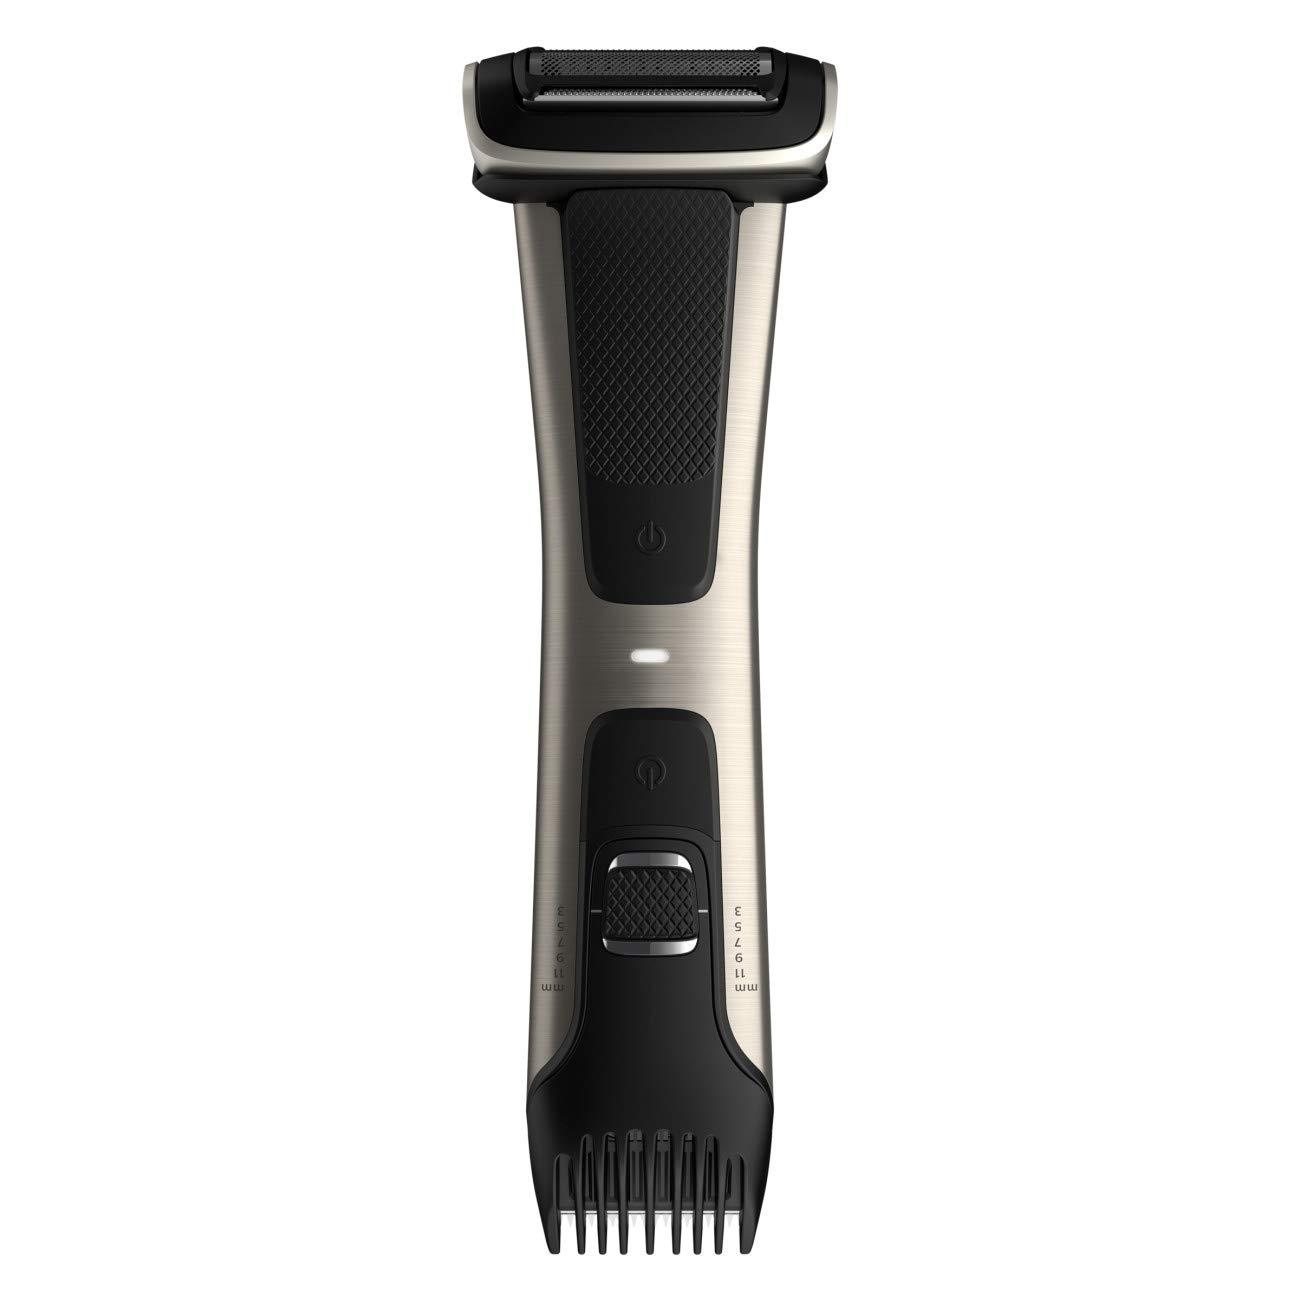 Philips Norelco BG7030-49 Bodygroom Series 7000, best body groomers